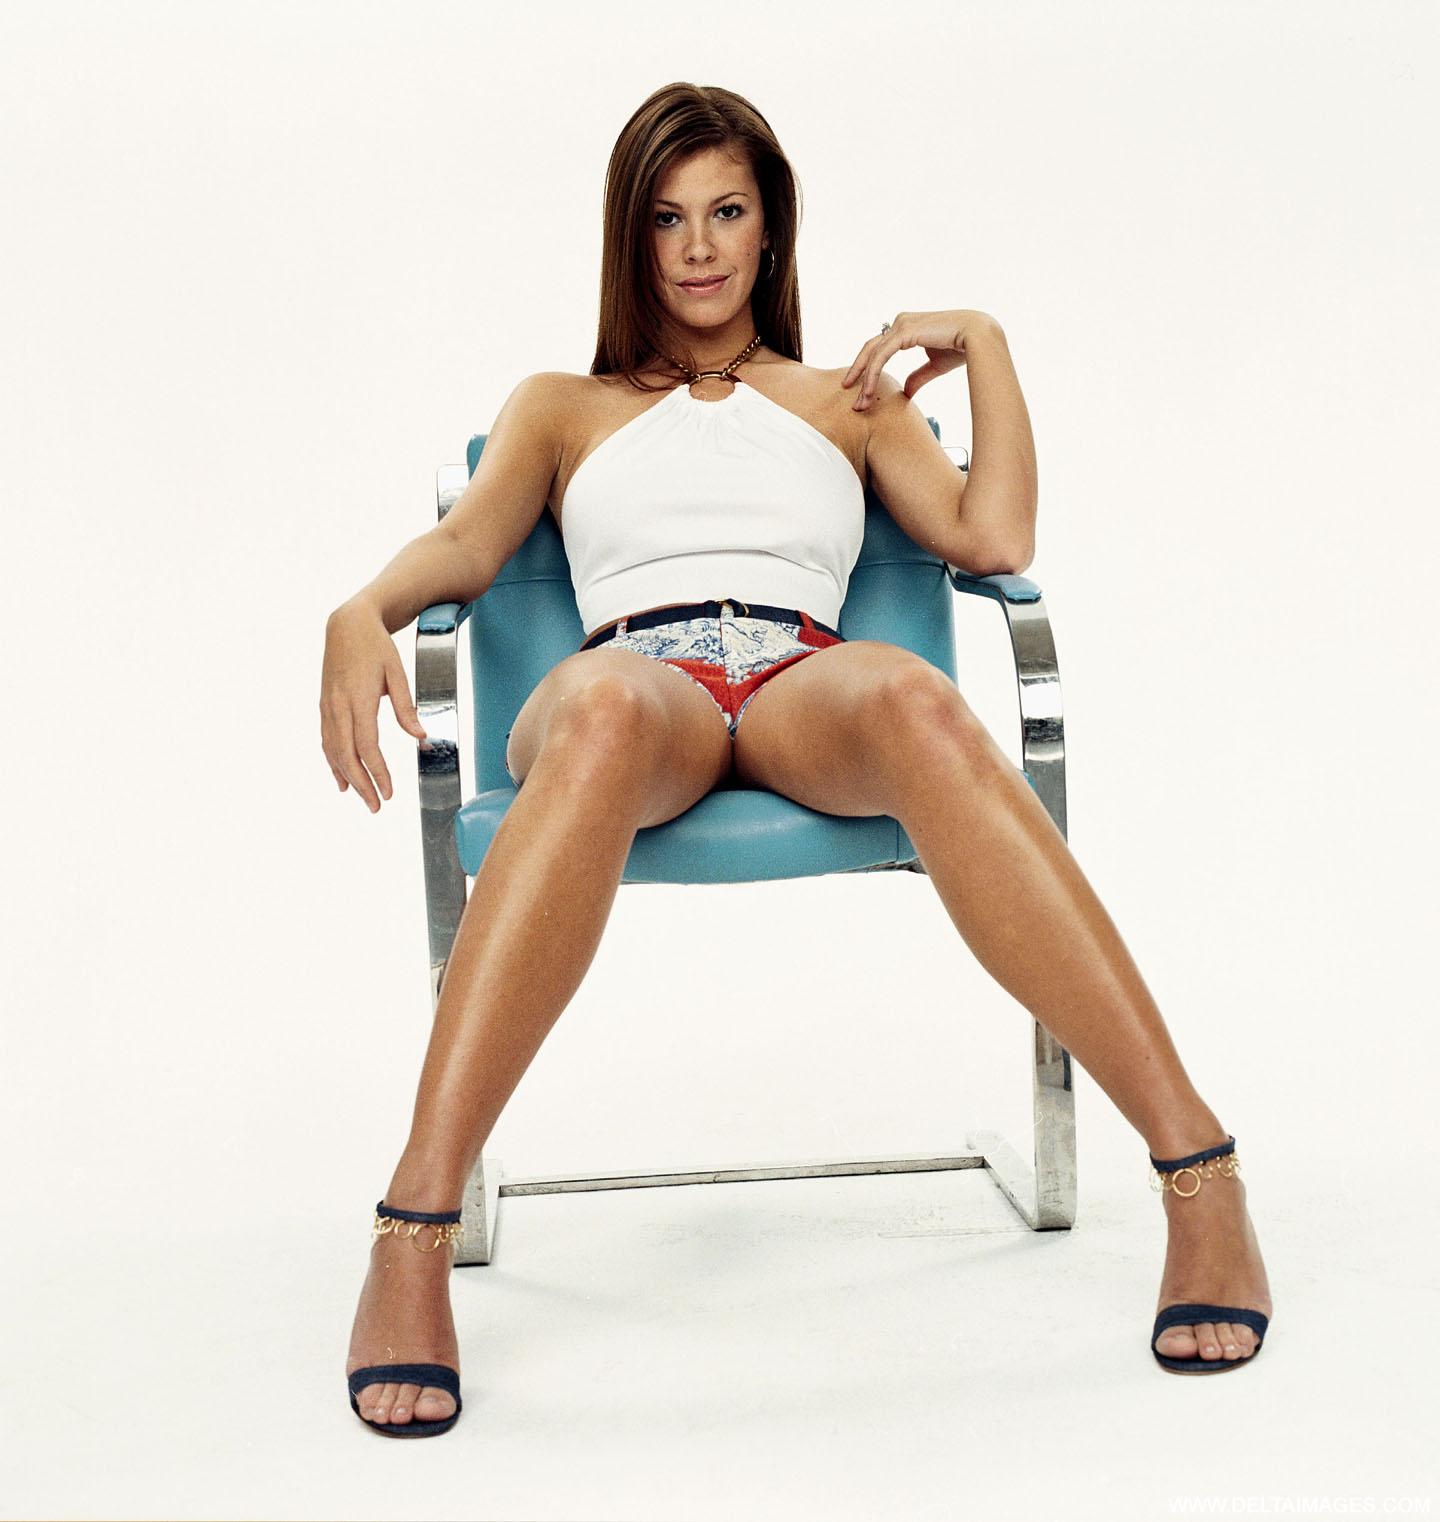 Nikki Cox Nude Pics & Videos That